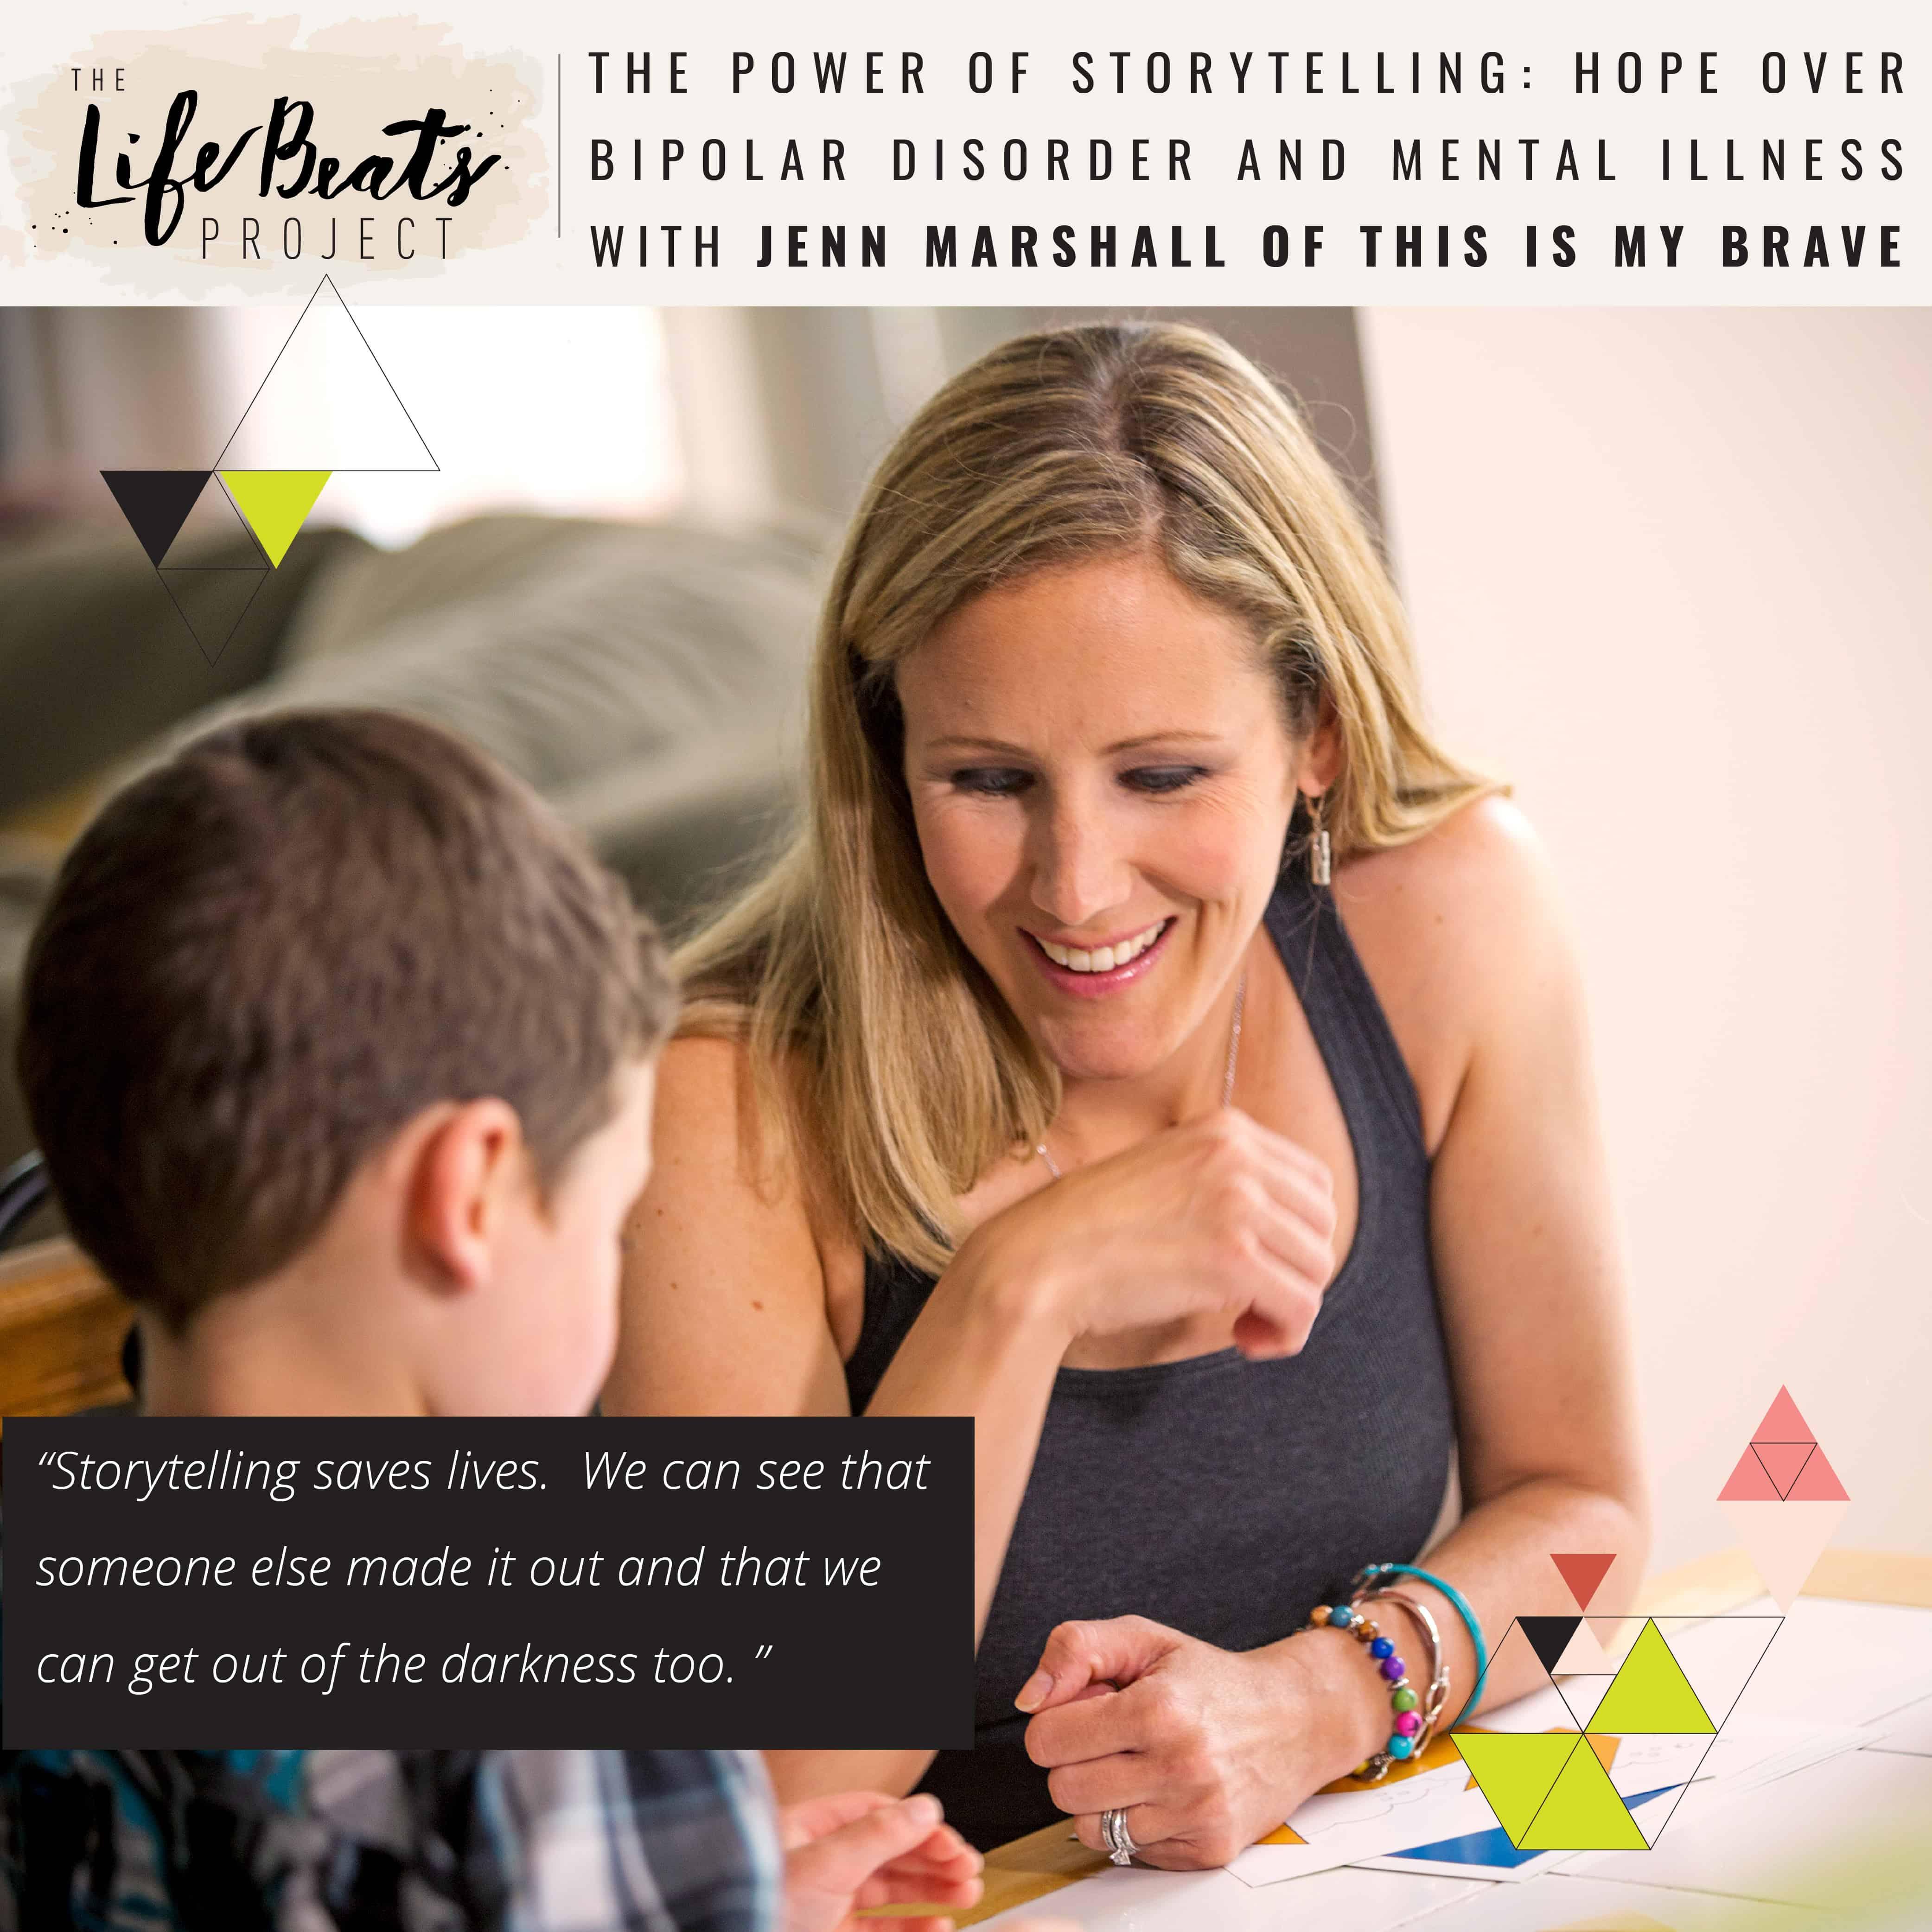 bipolar disorder mom life mental illness storytelling manic episode podcast